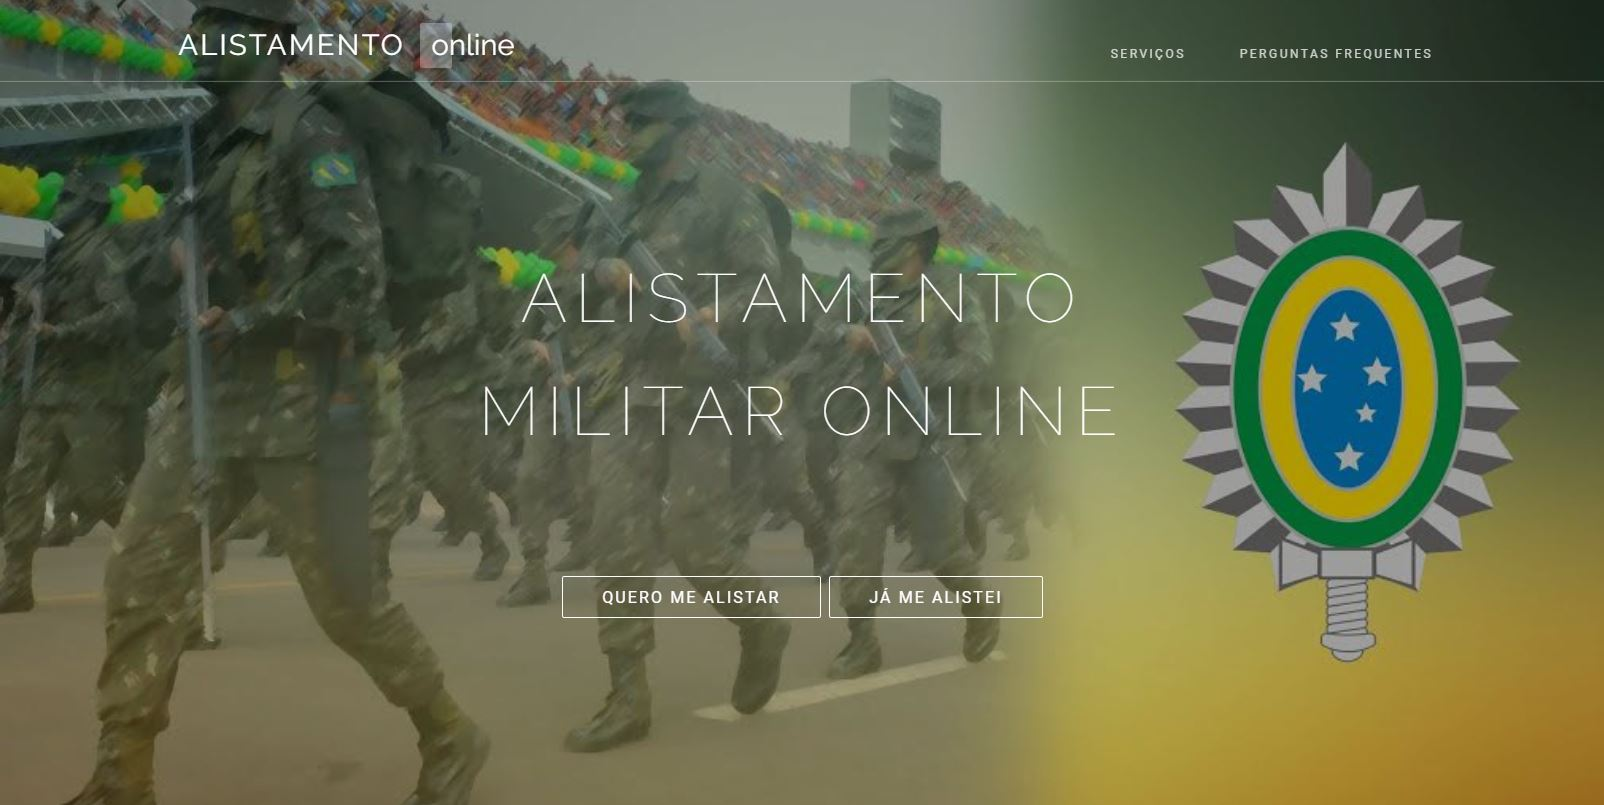 Site Alistamento Militar